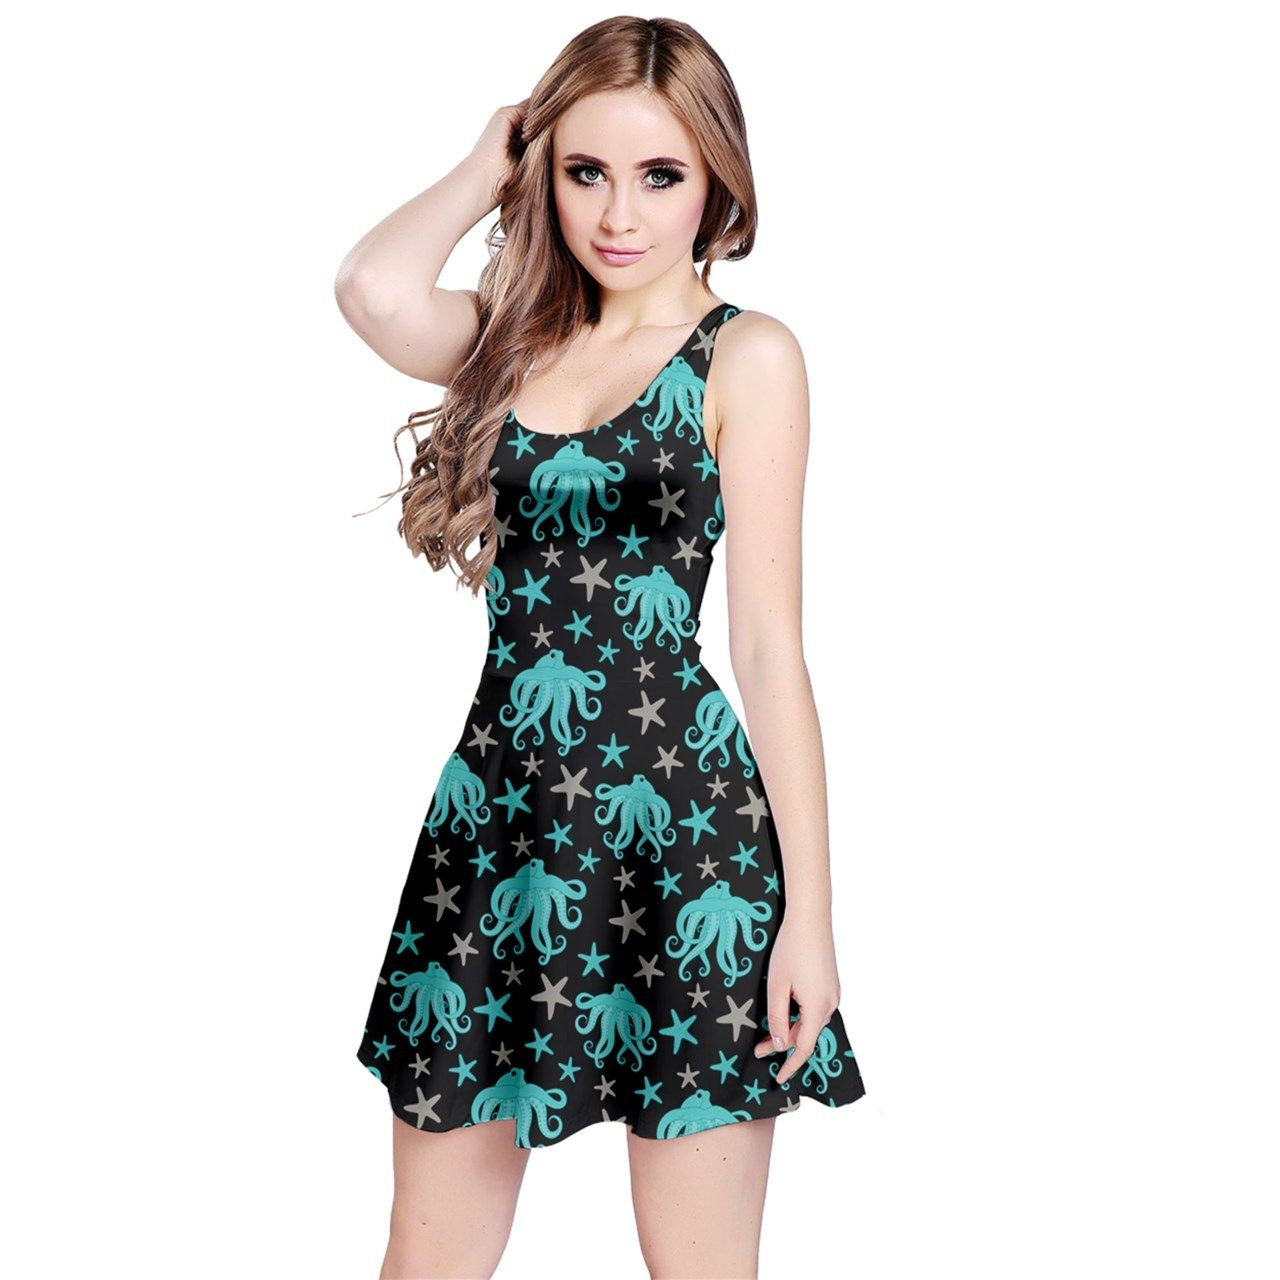 54ab68fc497e27 Women s Octopus Starfish Printed Elastic Swing Sleeveless Dress (XS ...